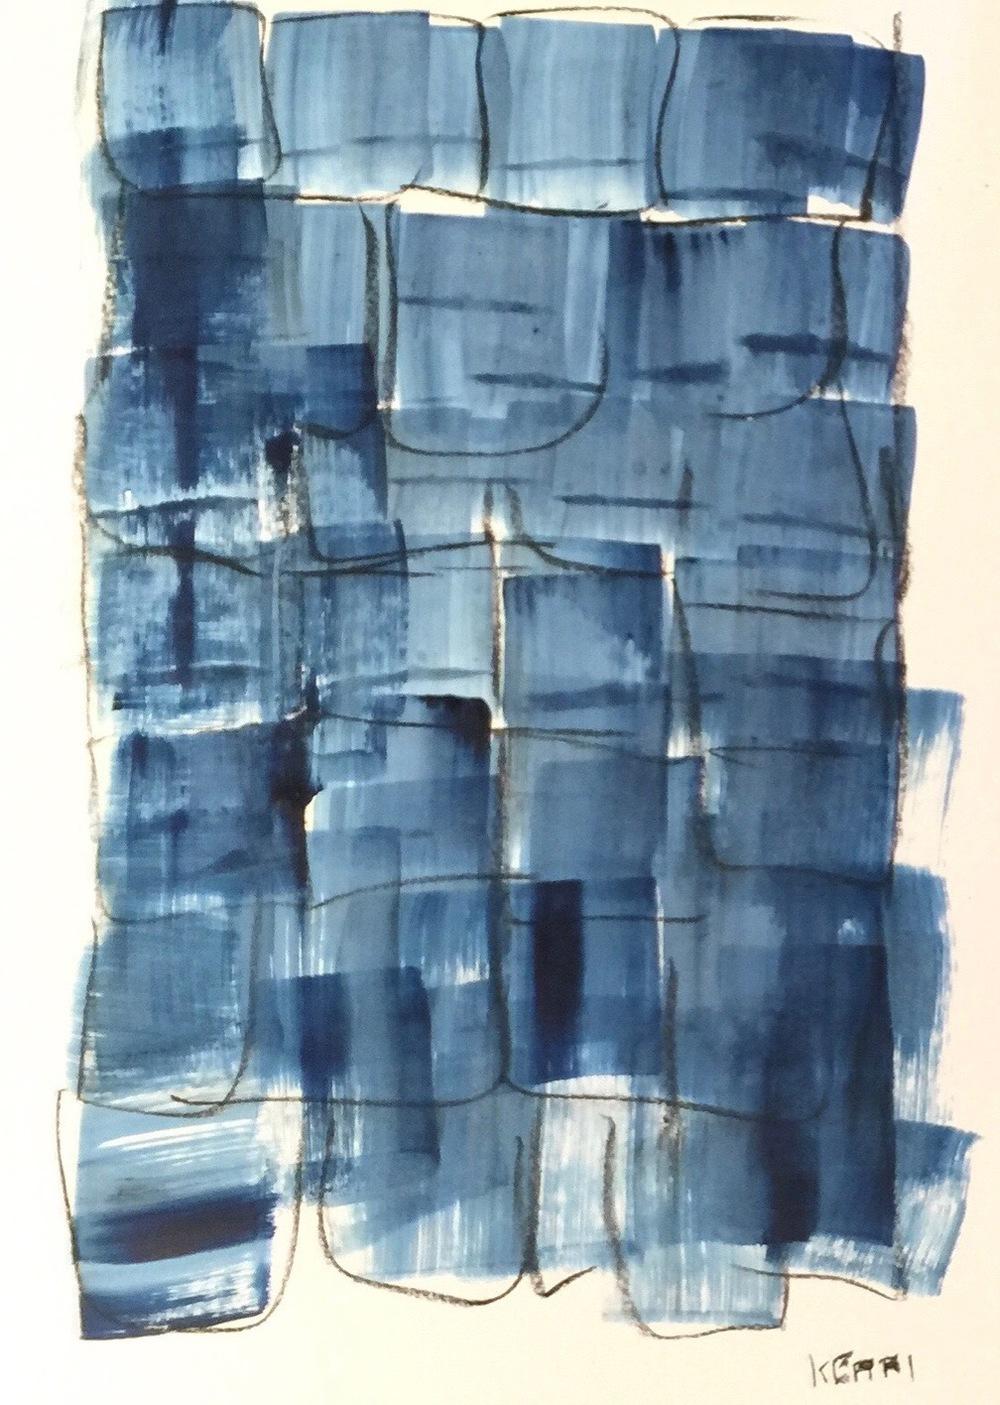 Indigo No. 1 on paper 25 x 19